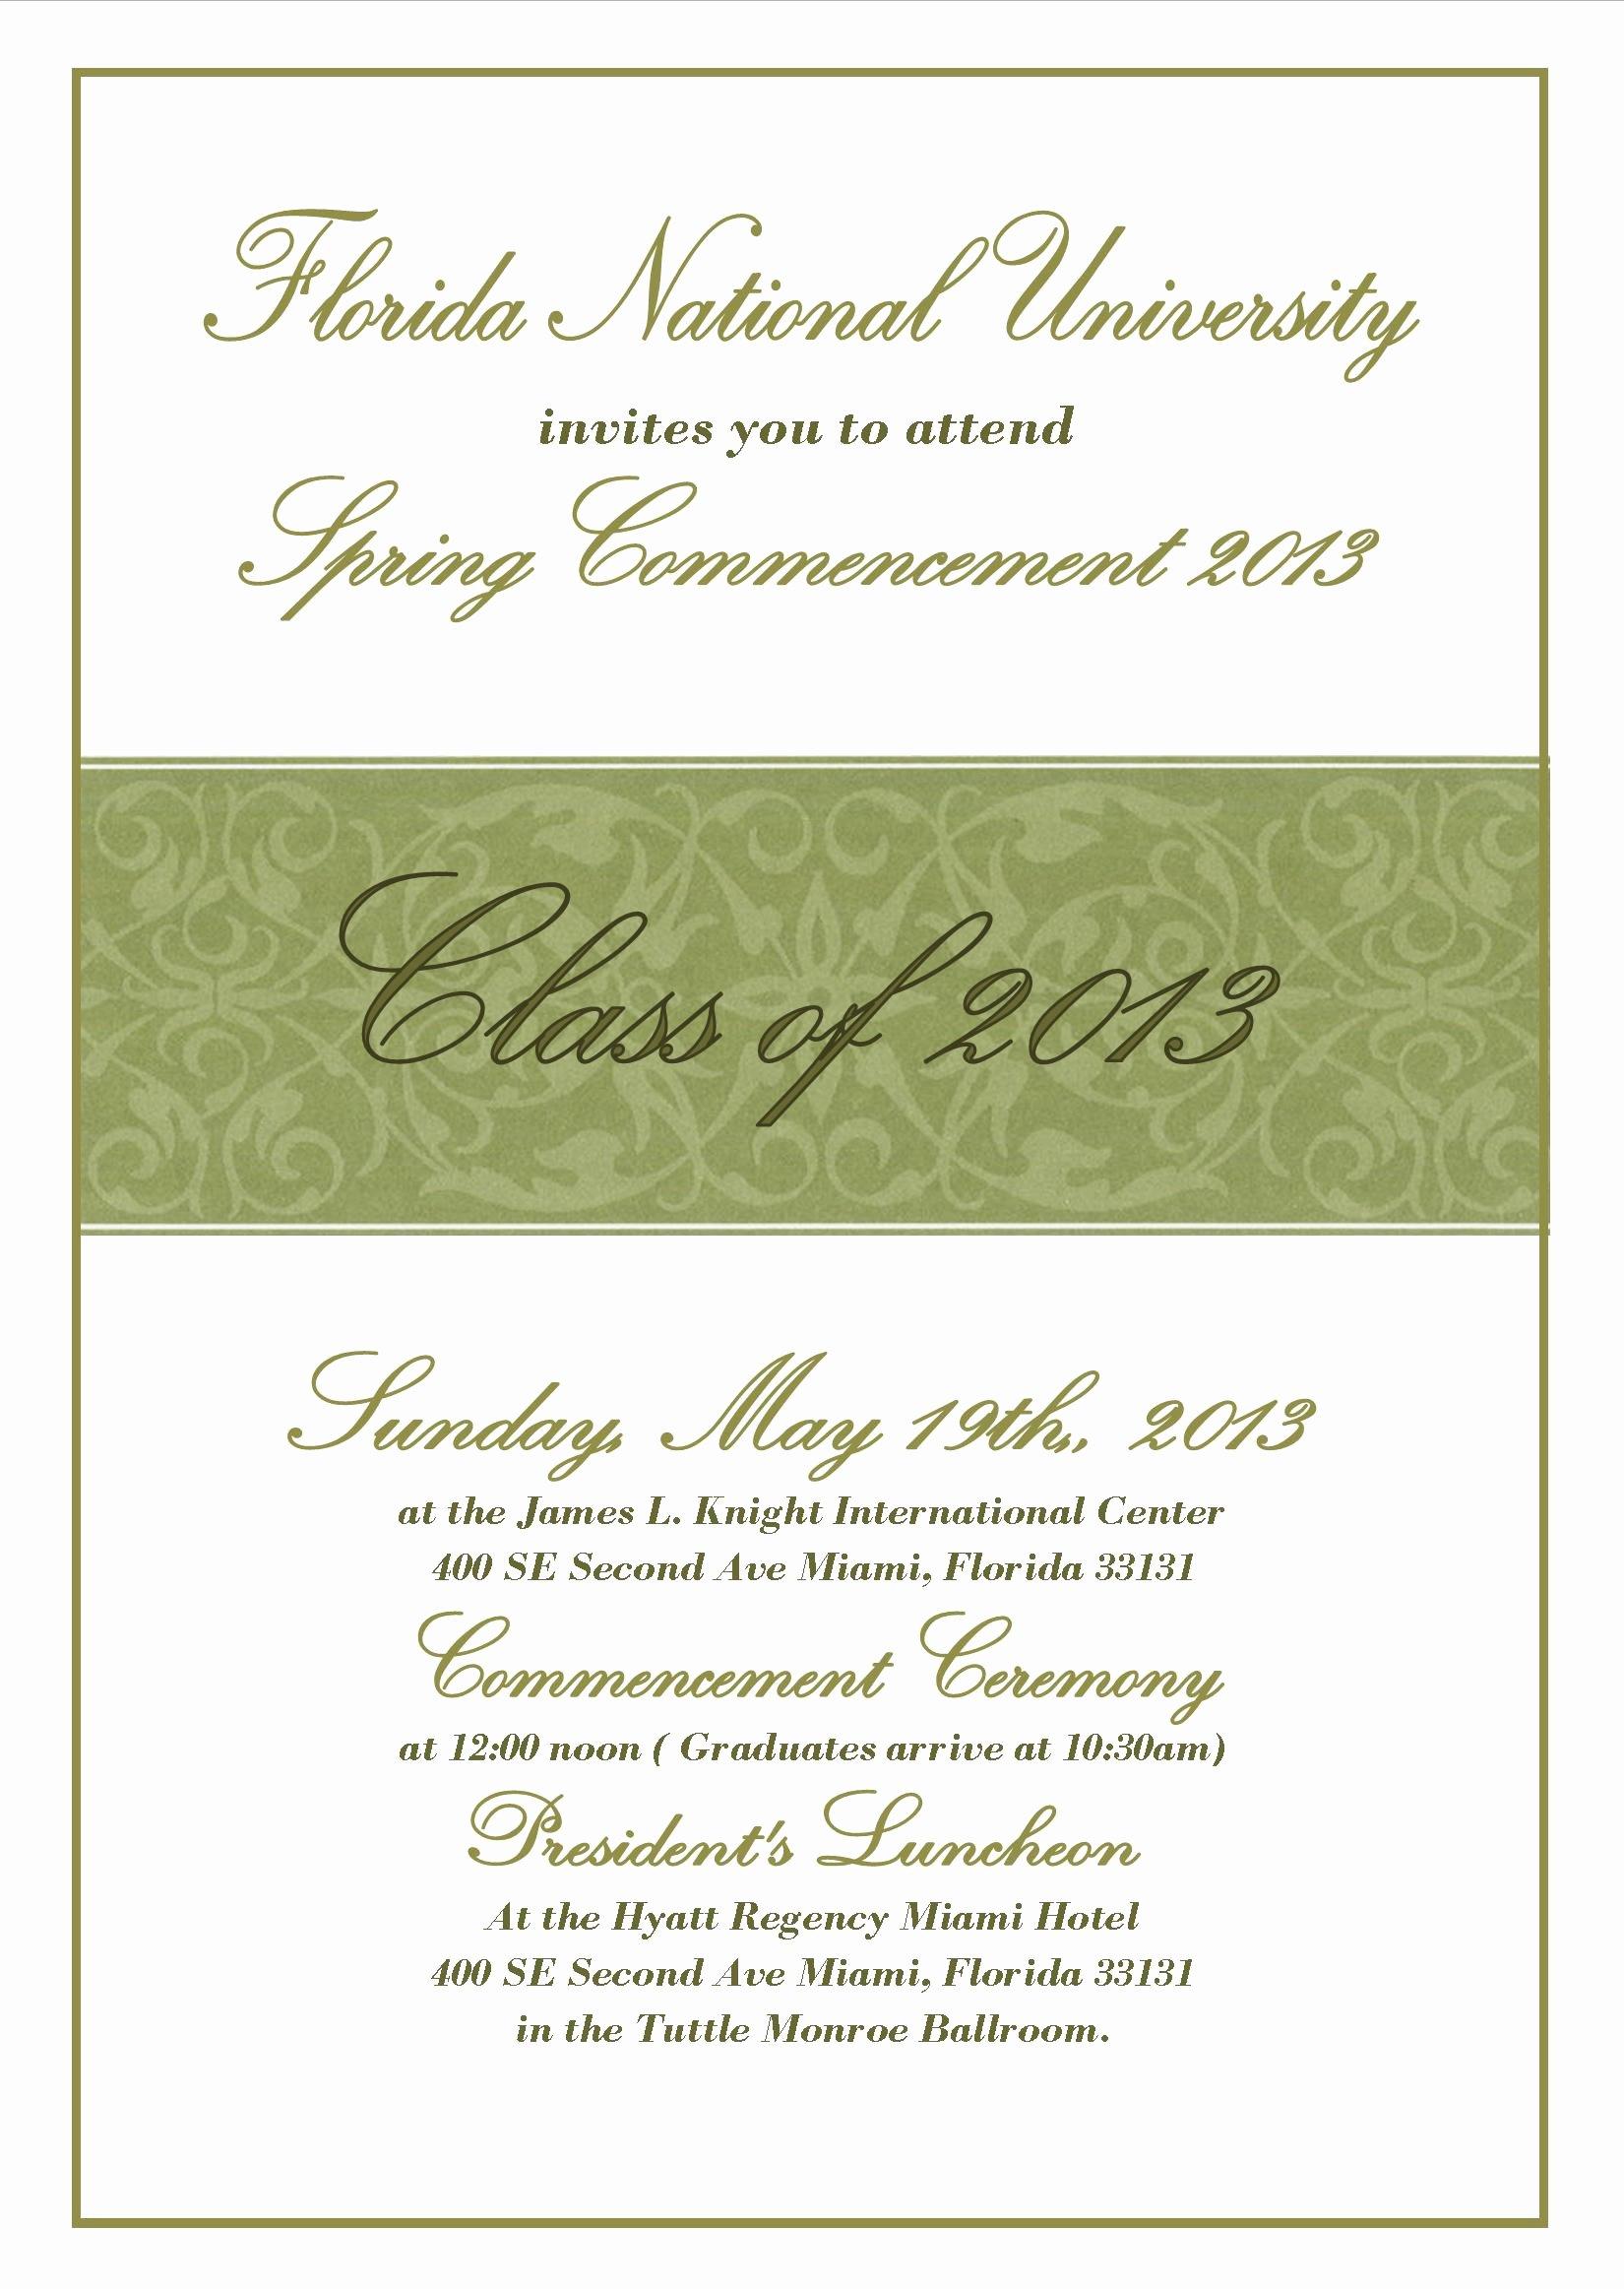 Graduation Ceremony Program Template New Mencement Ceremony Invitation